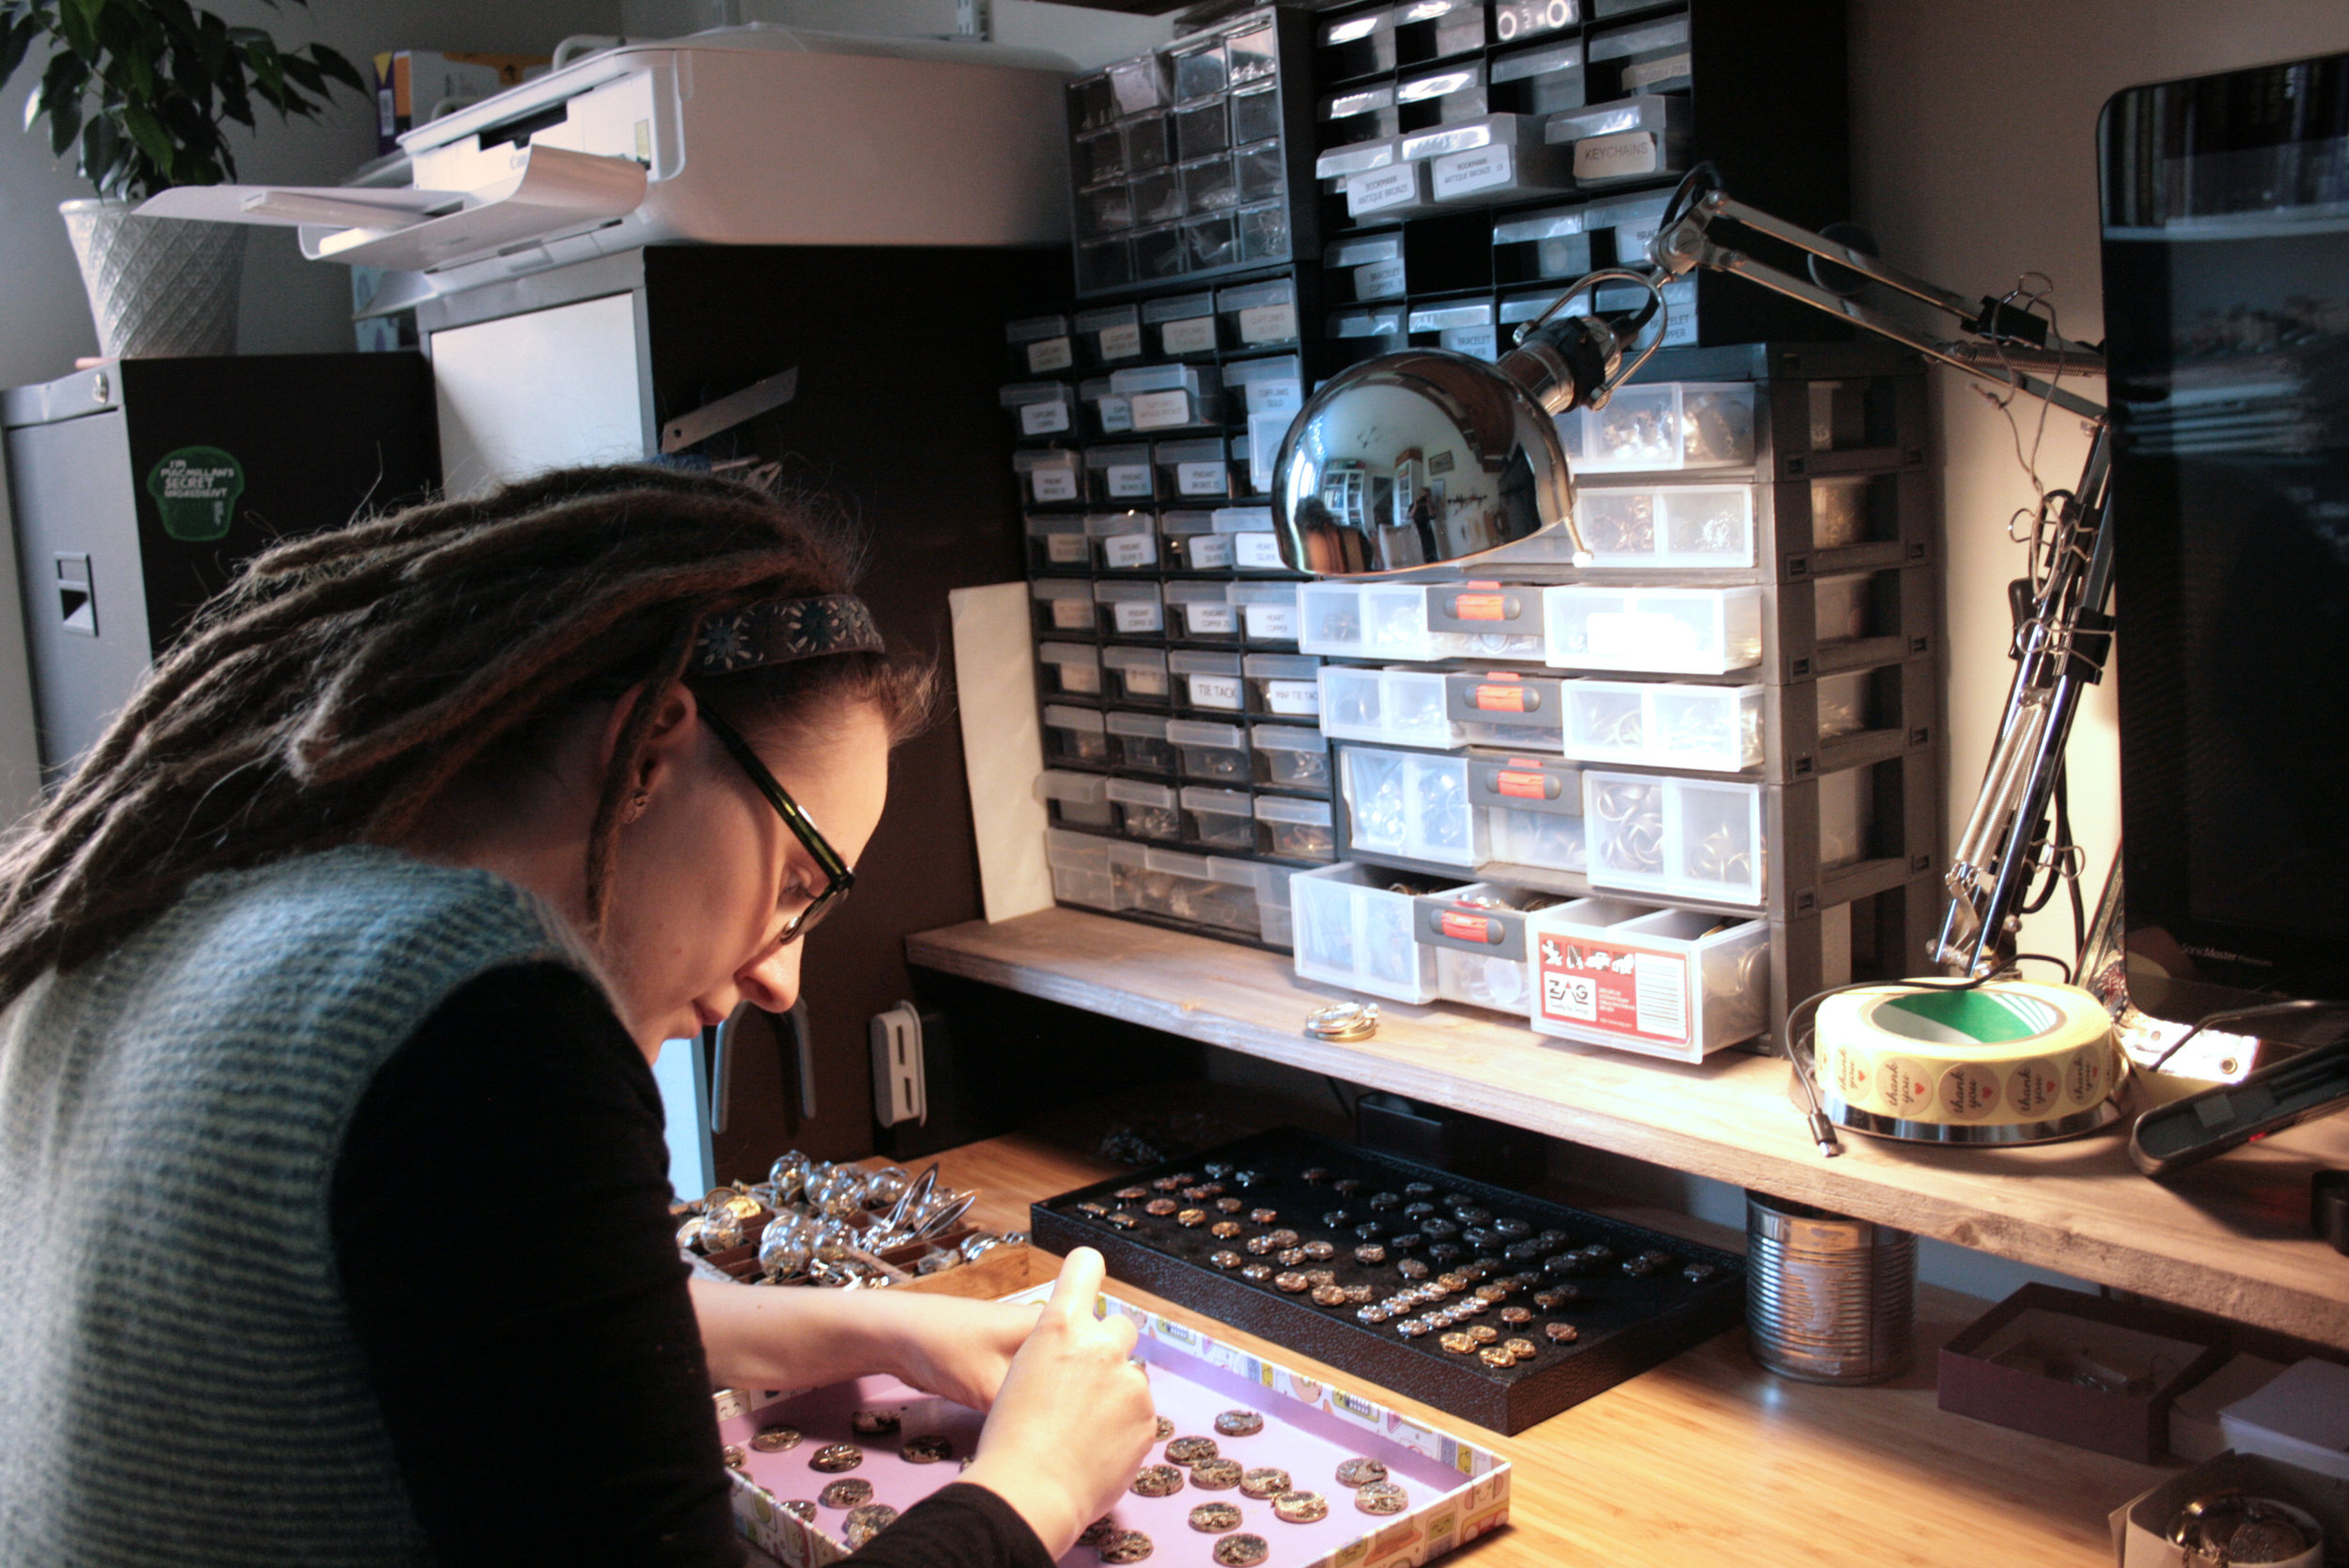 Eva Gifted Hands working on watch movement jewellery in he home studio.